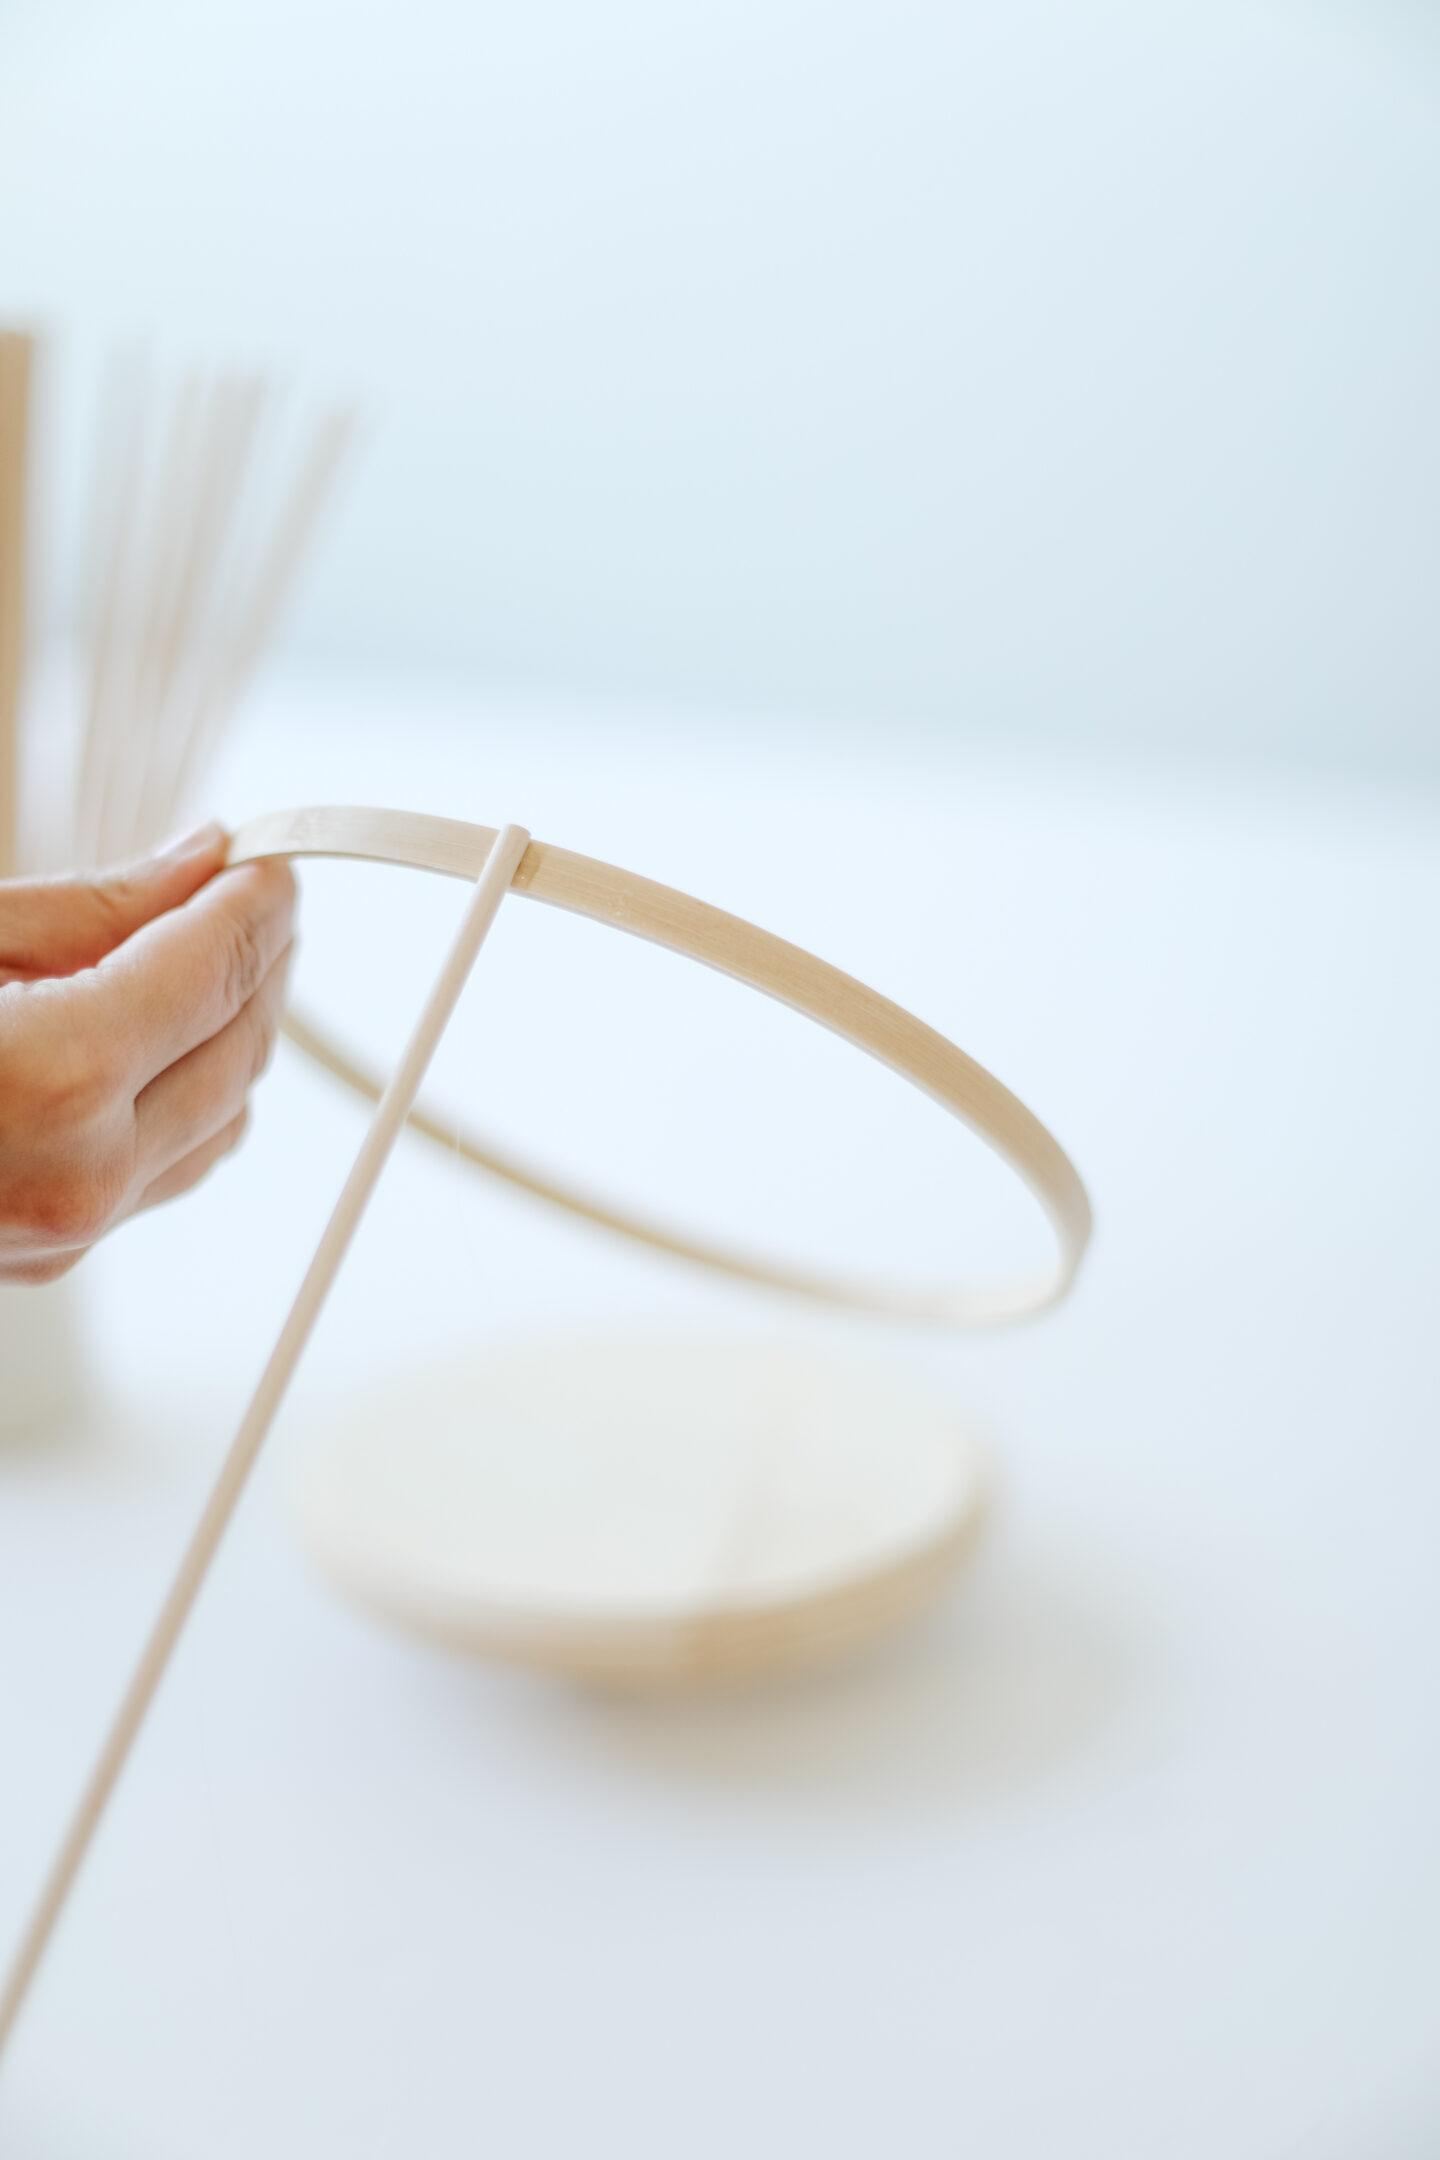 Scandi wooden vase DIY tutorial